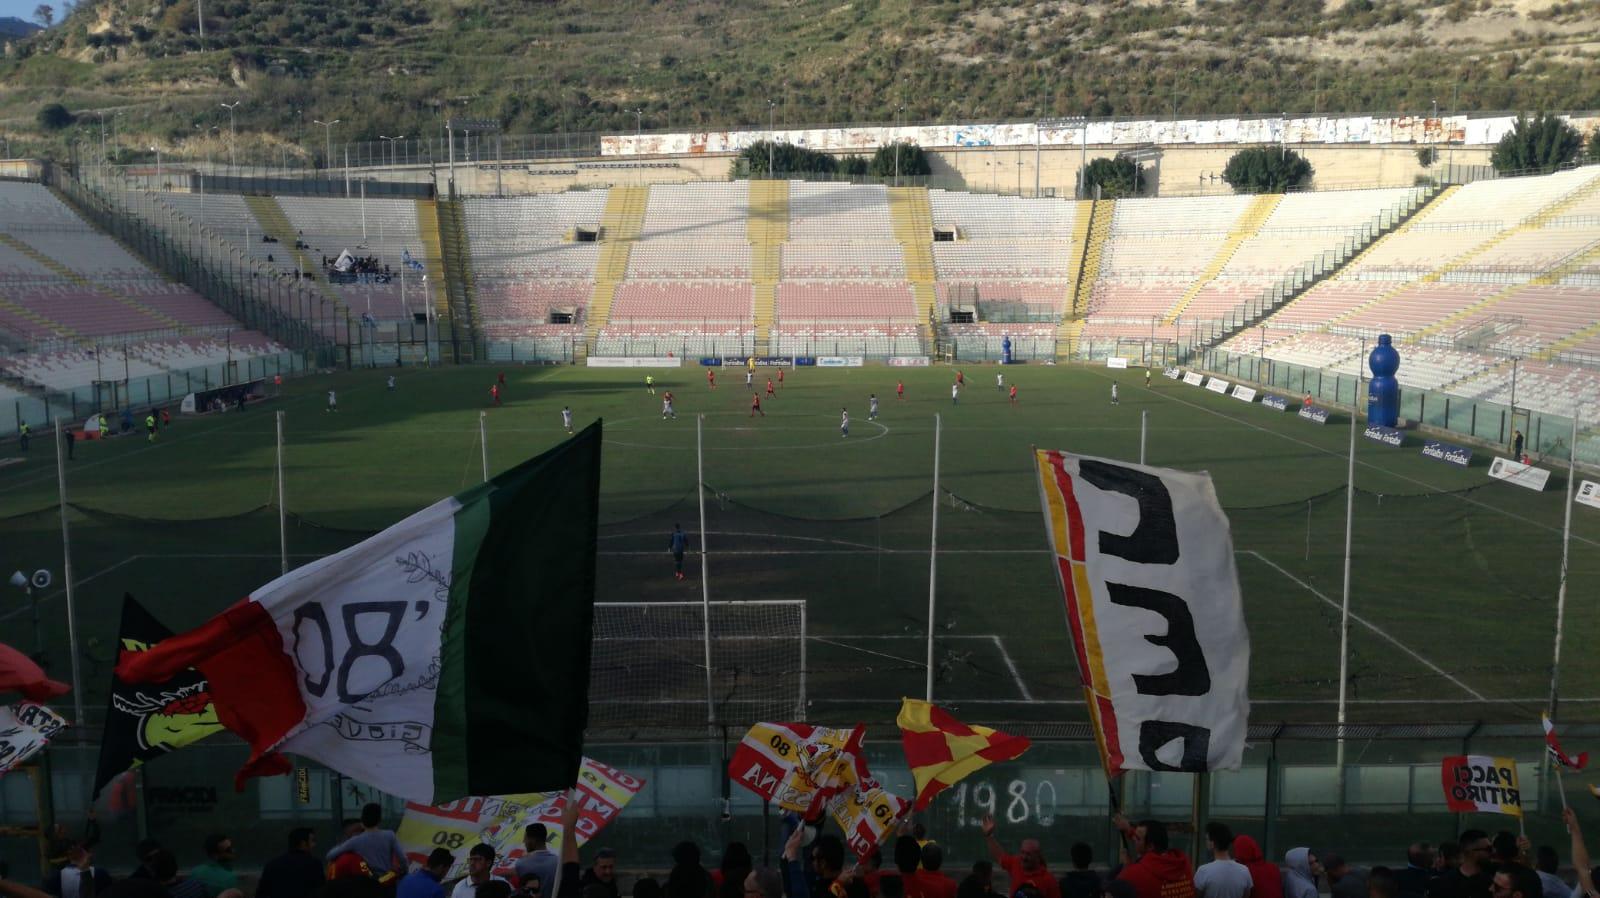 Foto dal match messina-gela